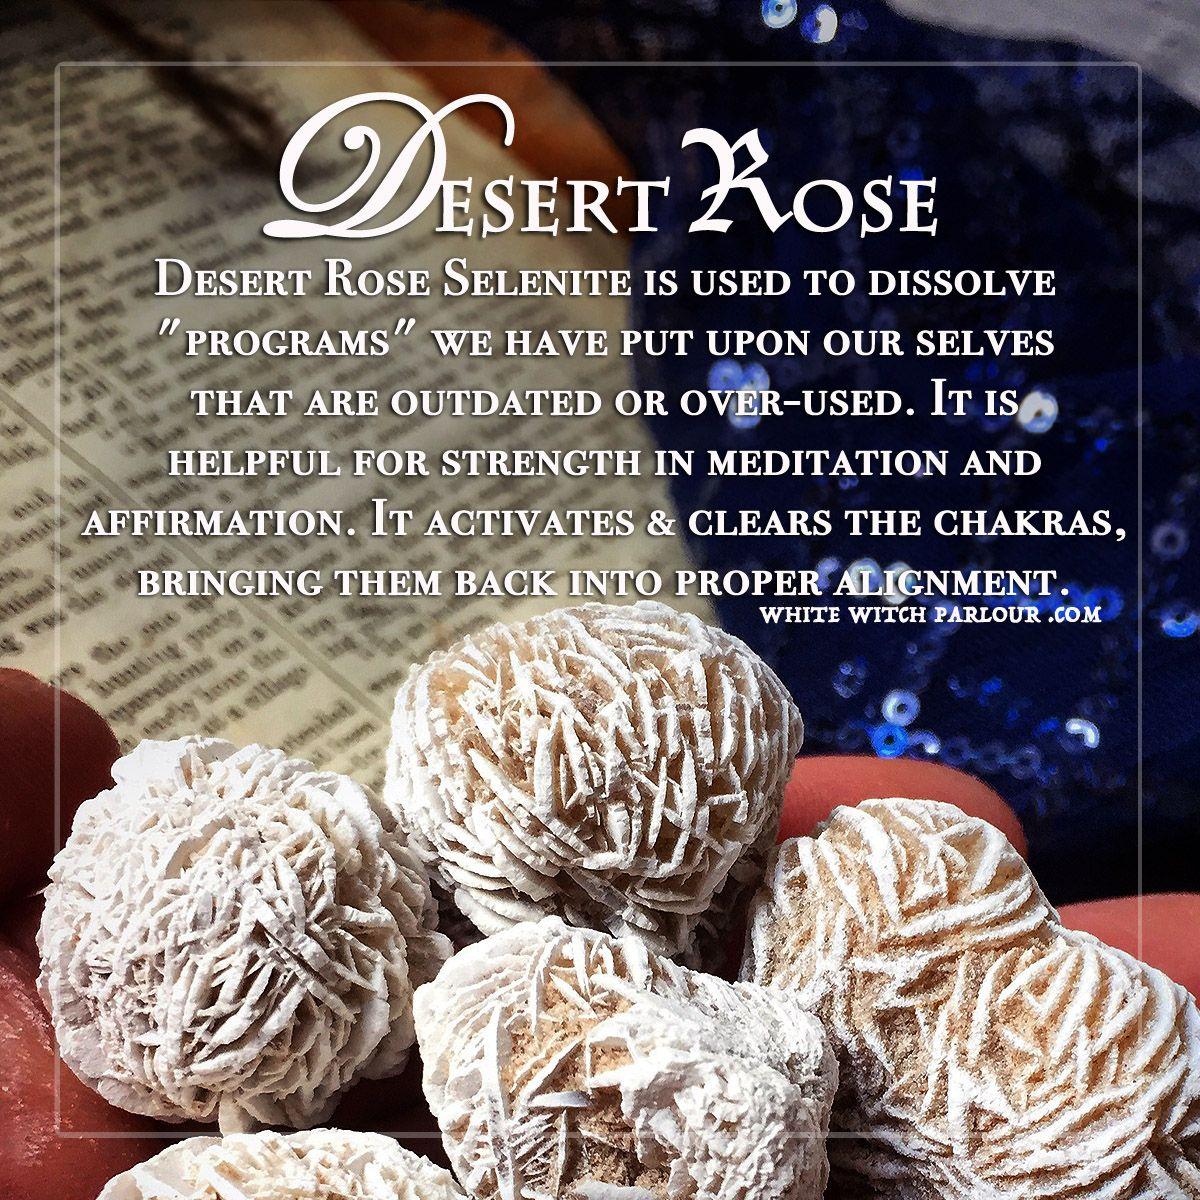 Desert Rose Selenite Raw Crystal Ball For Full Moon Cleansing Chakra Alignment Crystal Healing Stones Stones And Crystals Crystals And Gemstones